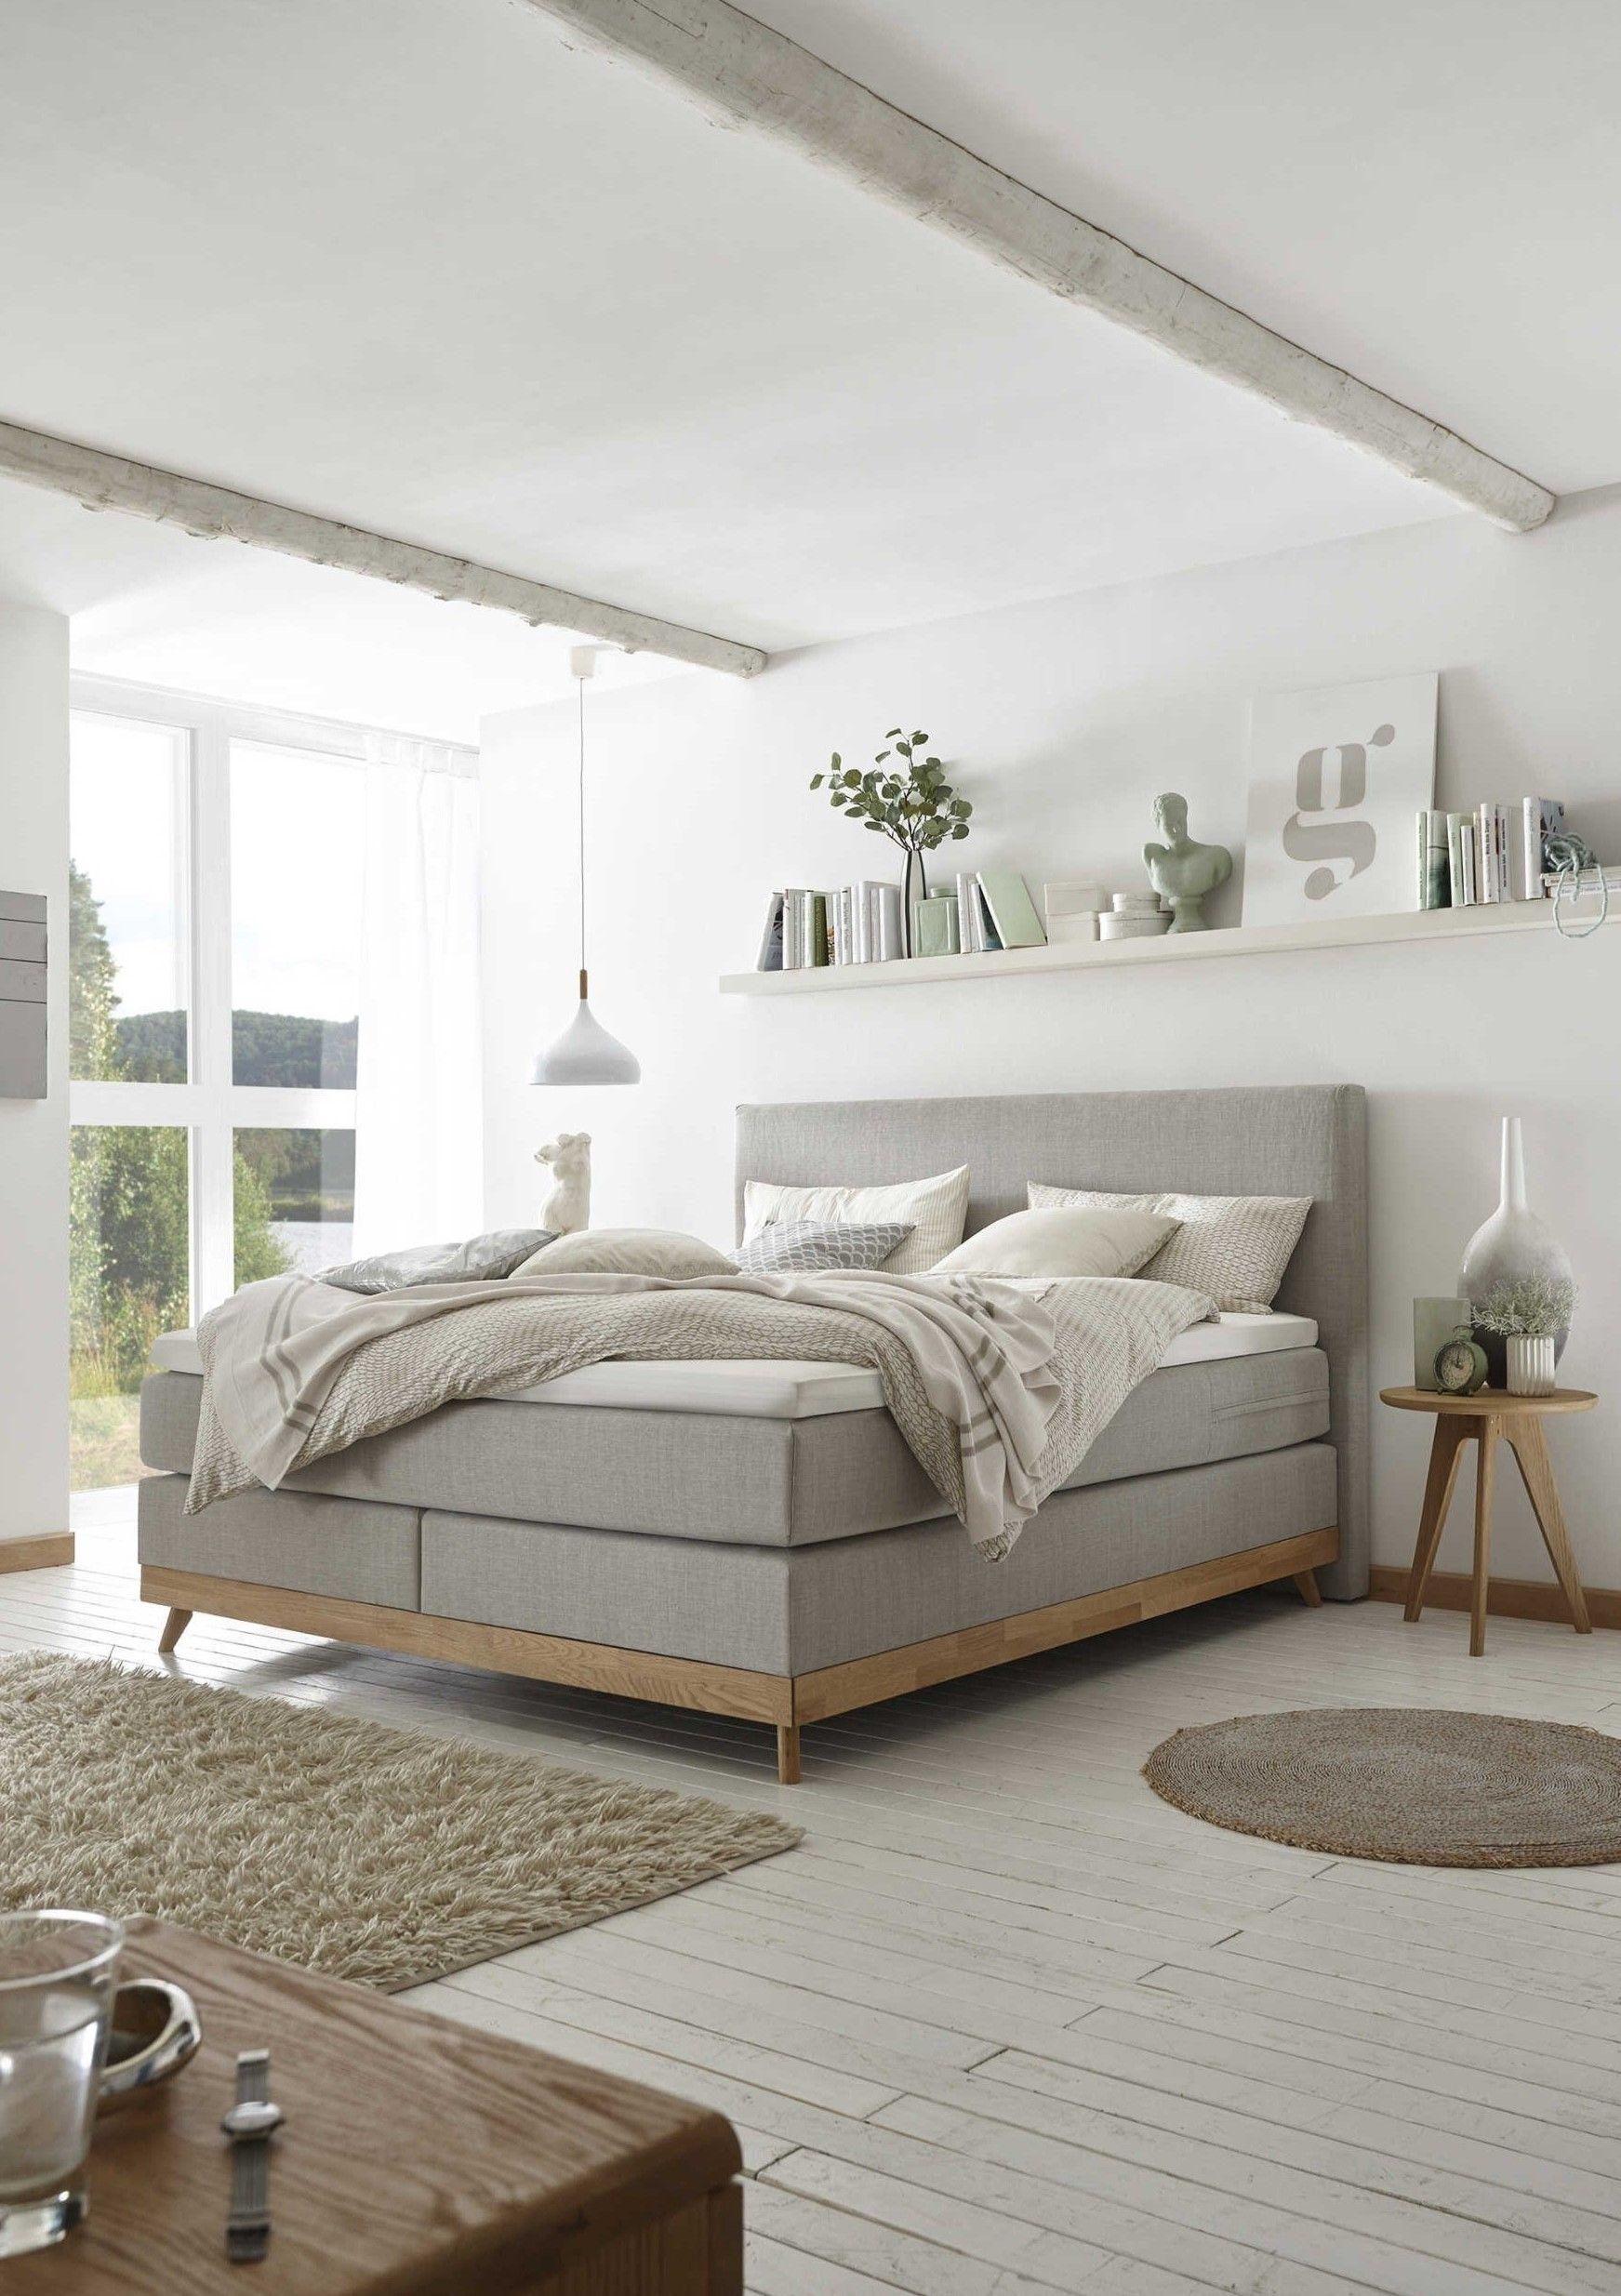 Scandinavian Design In 2020 Skandinavisches Design Zuhause Bett